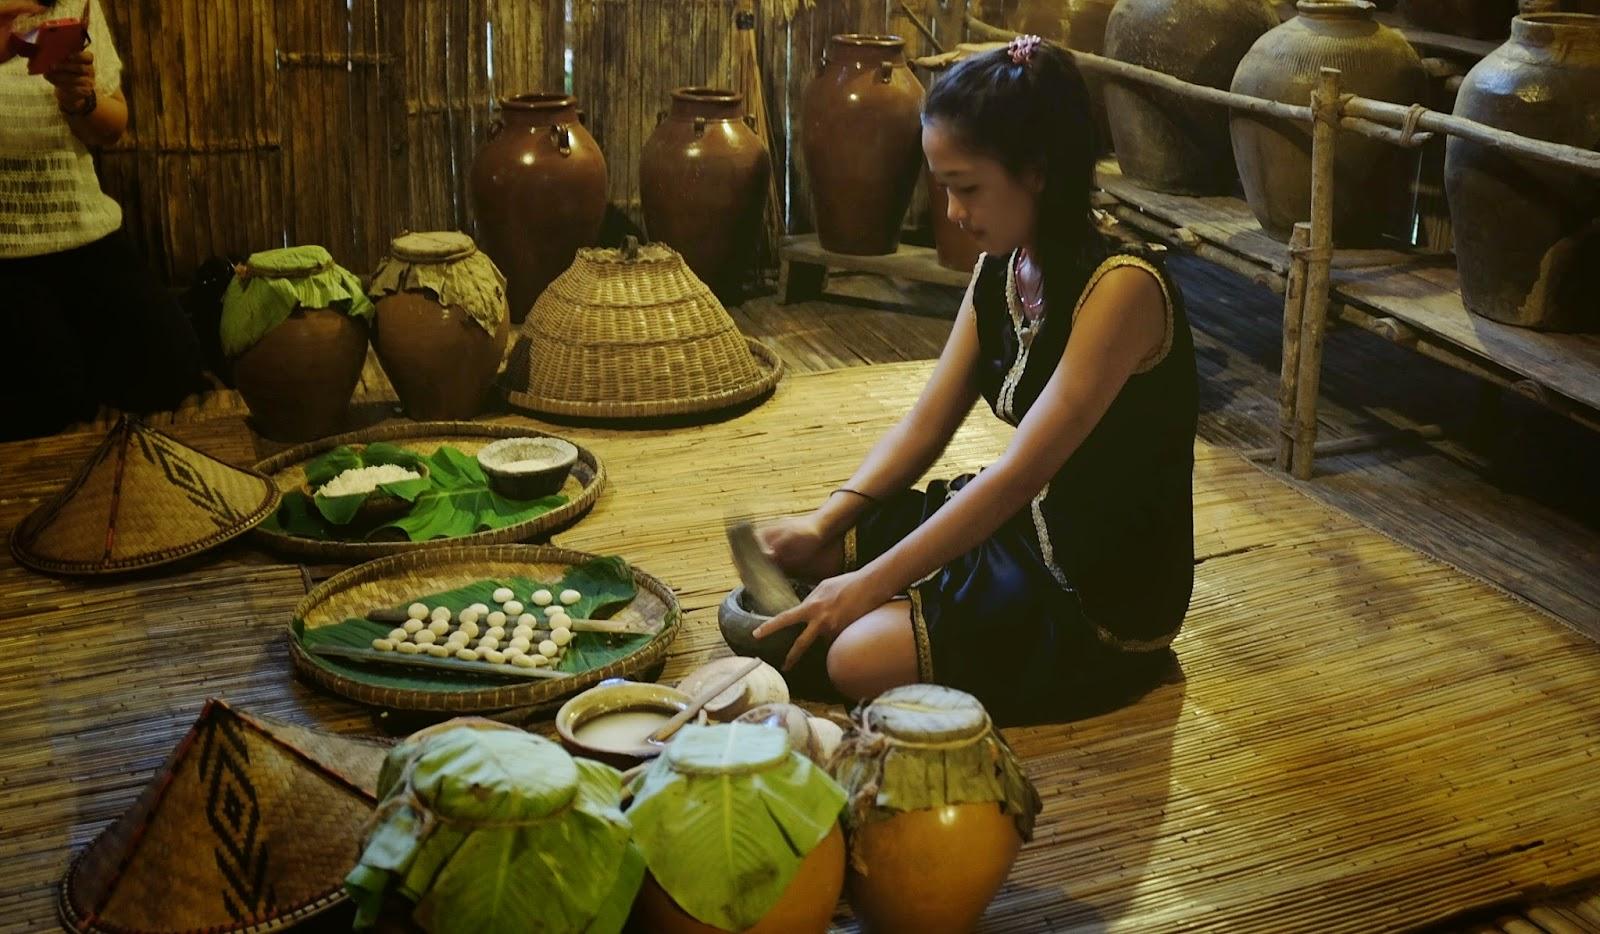 A young Dusun maiden preparing rice wine at Mari Mari Cultural Village